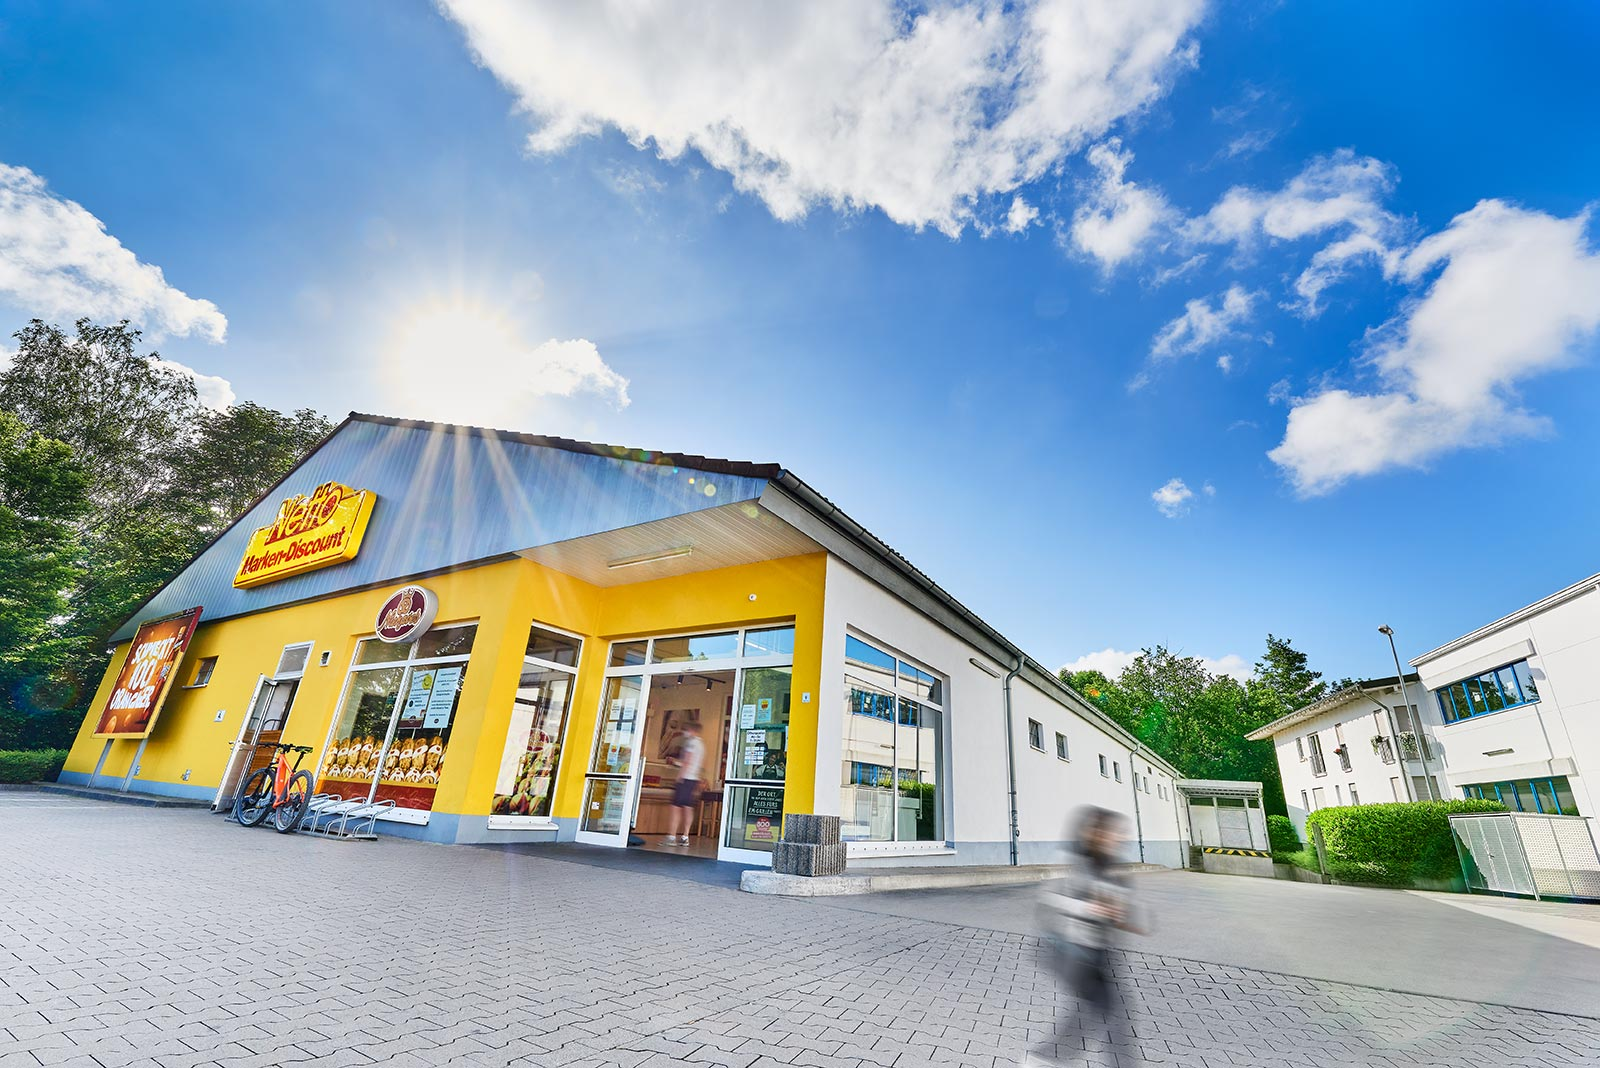 Immobilie in Schwerte: Multi-Tenant: Lebensmittel-Einzelhandel, Einzelhandel, Sonnenbank, Fitnessstudio, Büros